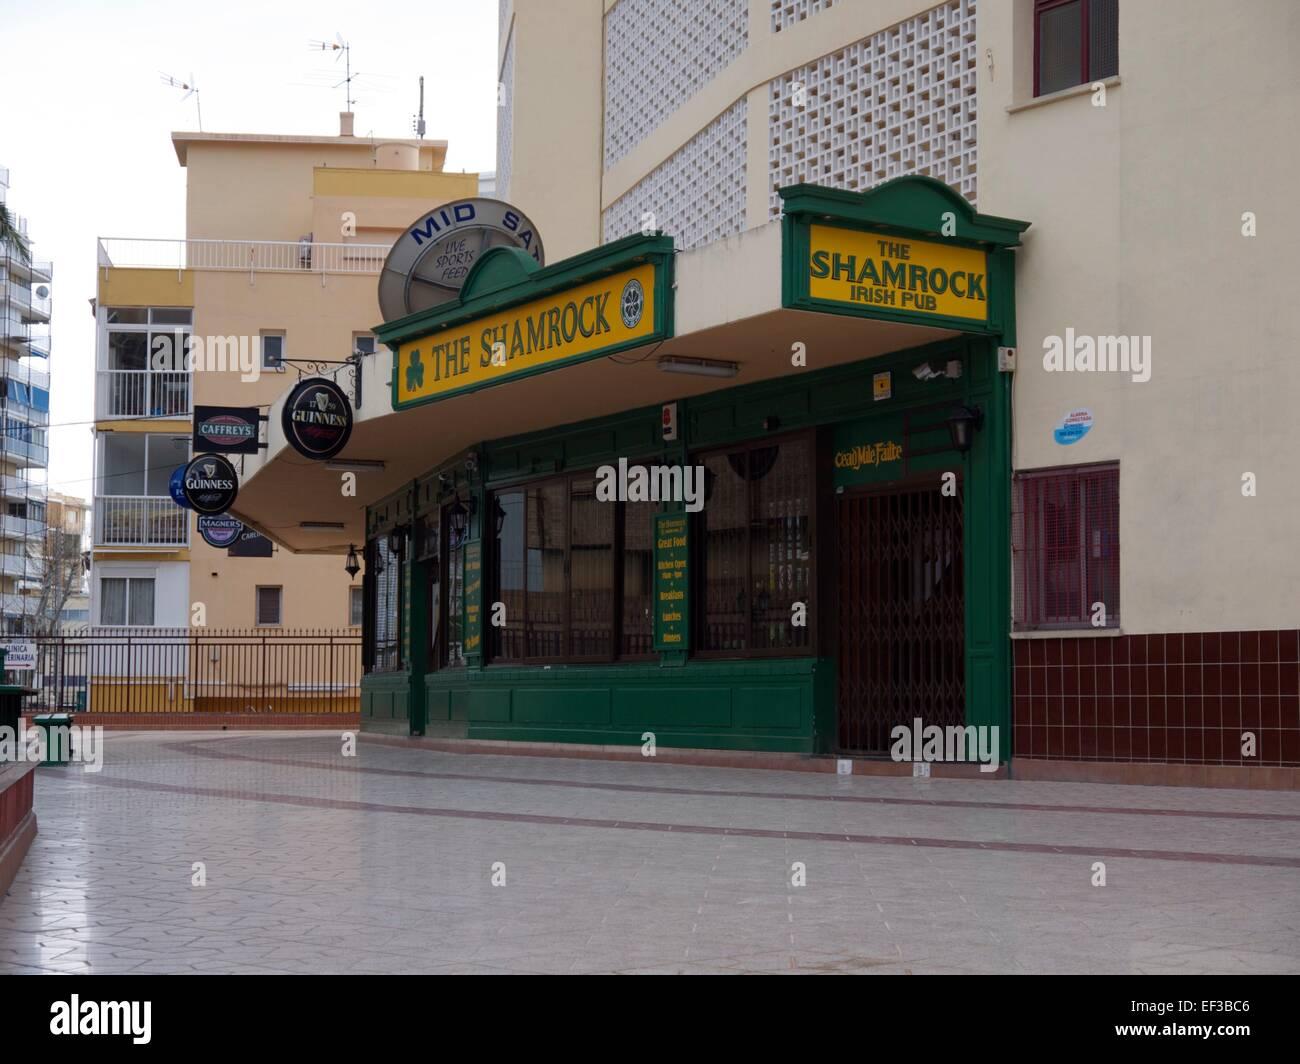 the shamrock irish pub in benidorm spain stock photo royalty